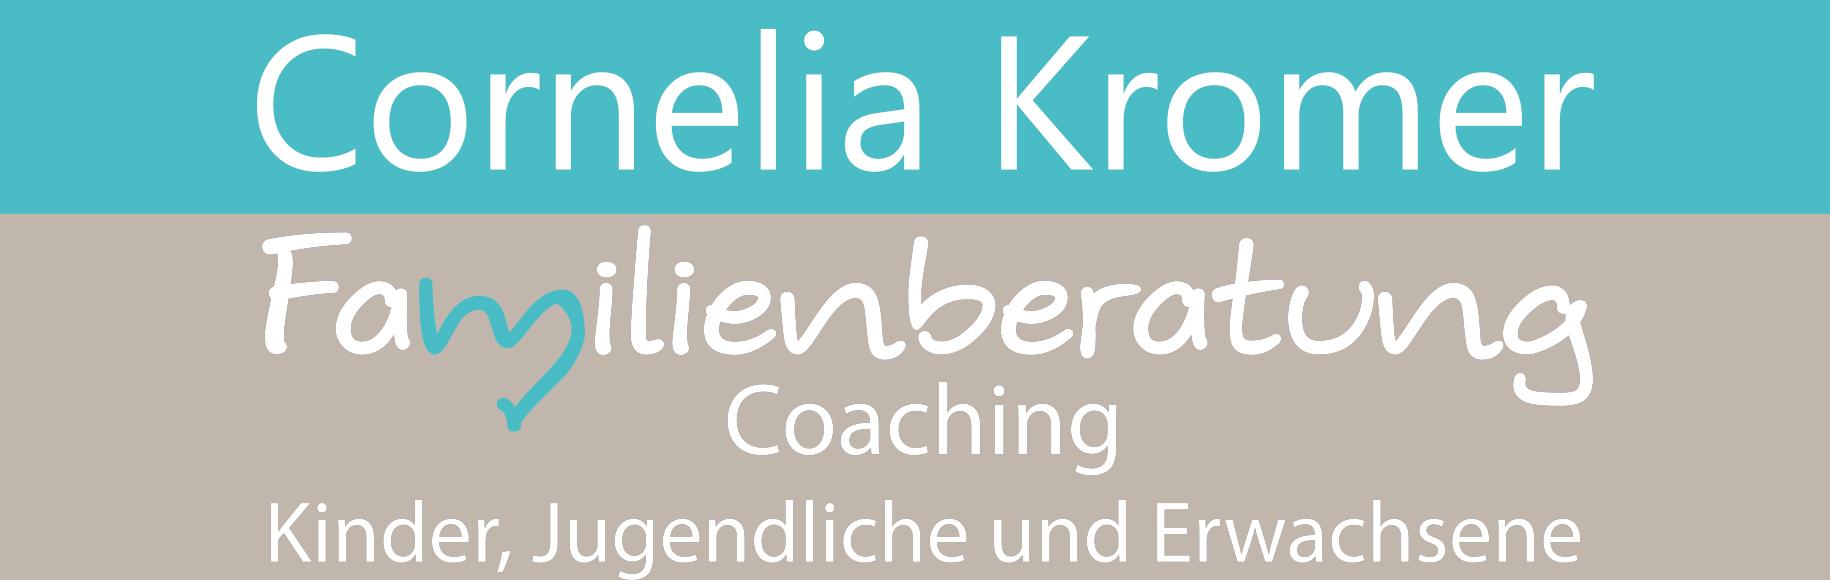 Cornelia Kromer – Familienberatung